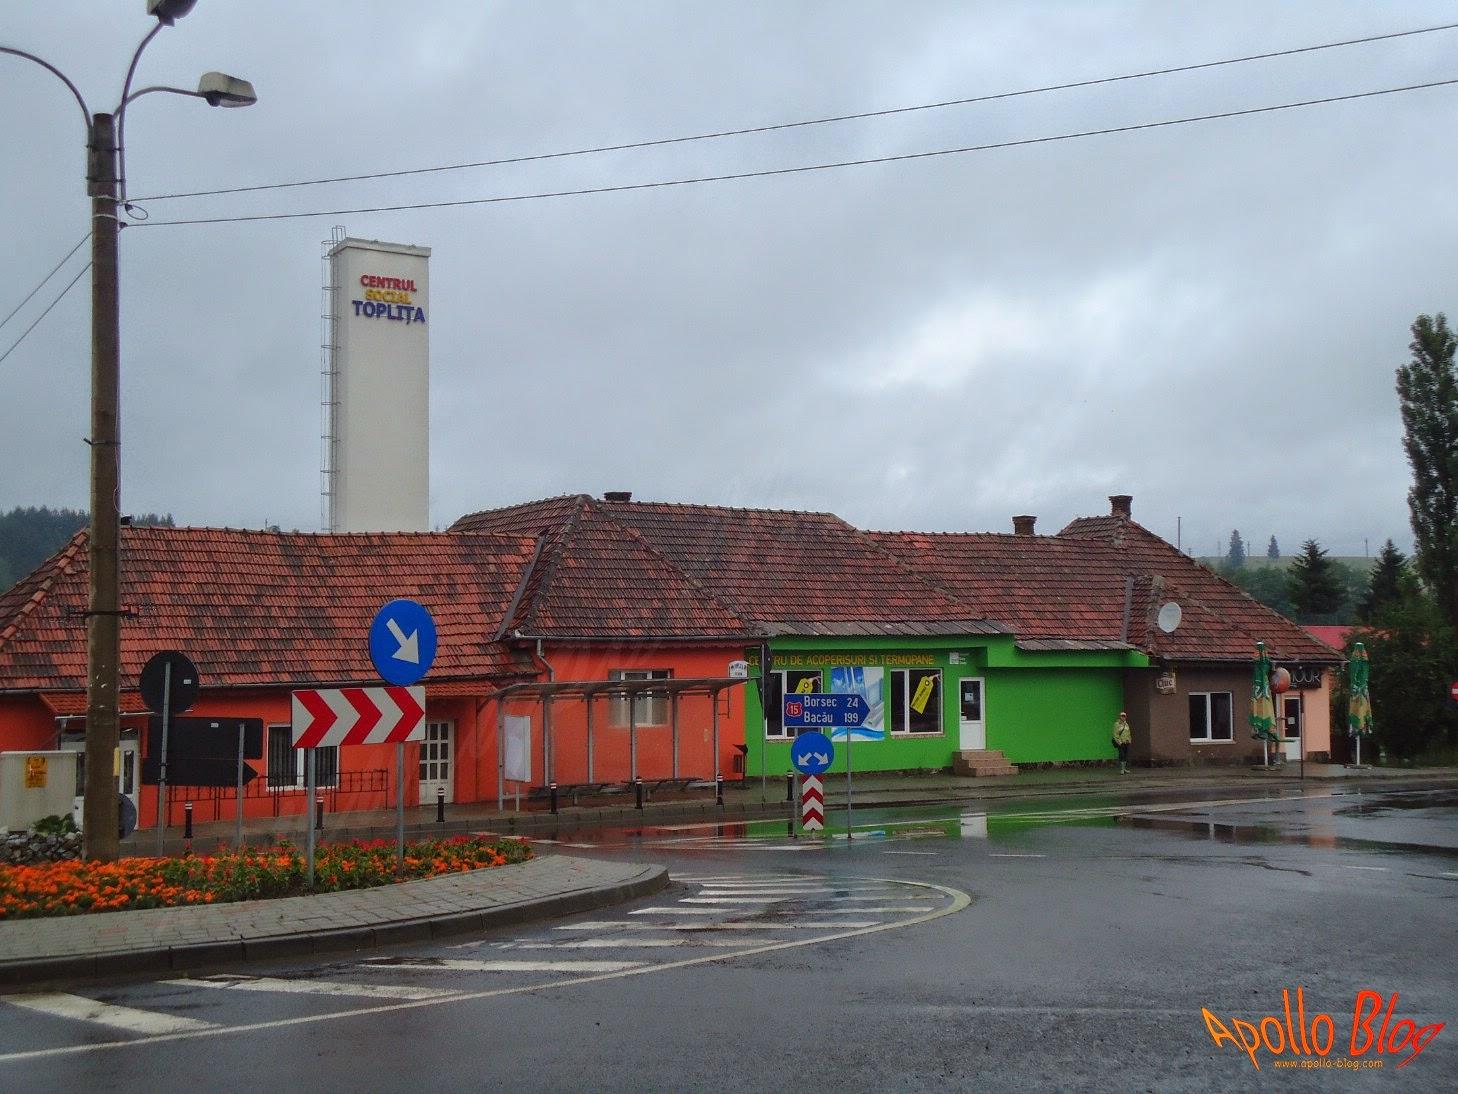 Centrul Social Toplita